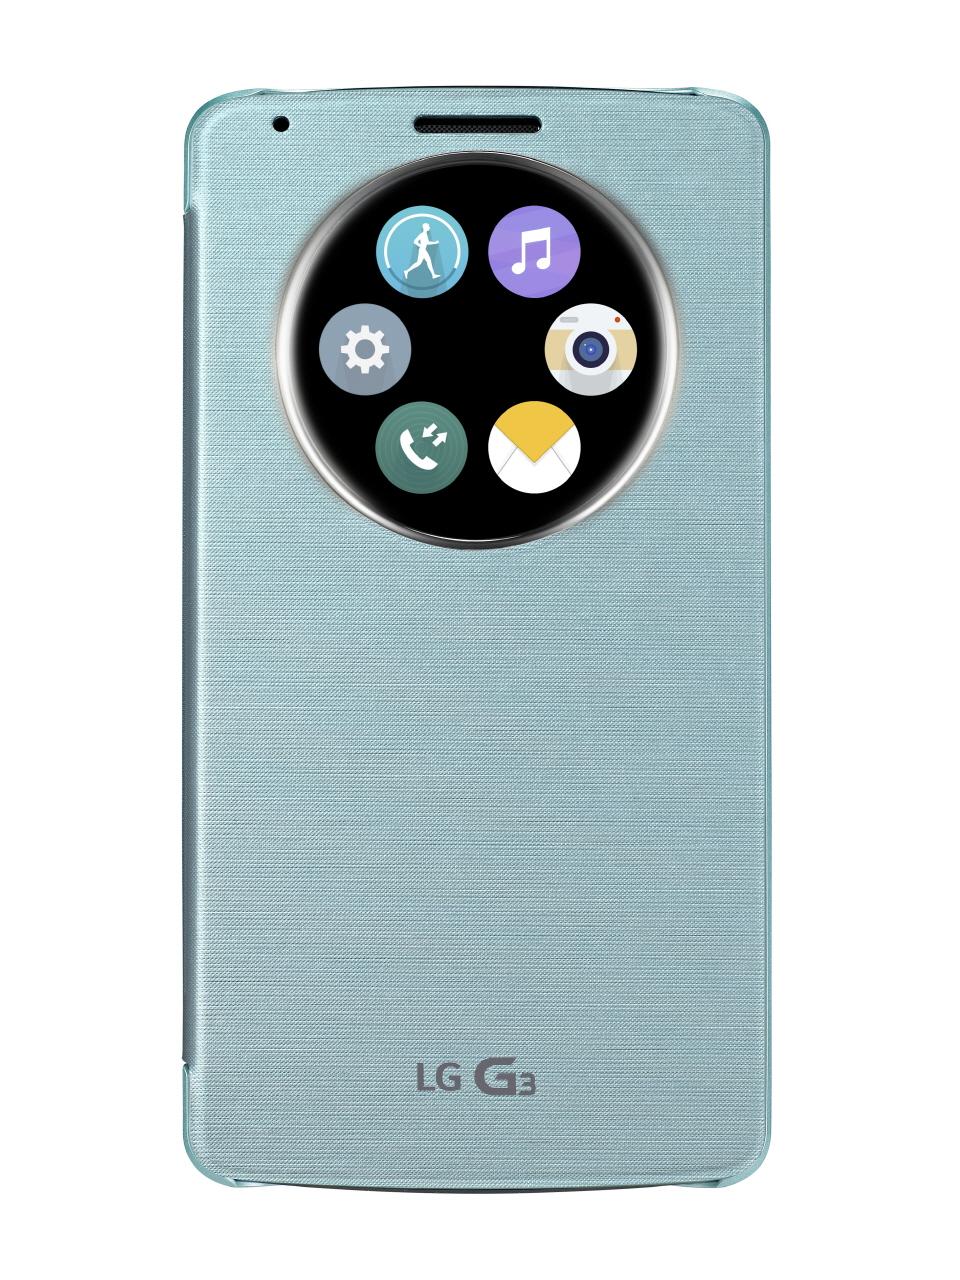 Lg G3 Wikipedia Touchscreen Optimus Stylus D690 Original Quickcircle Case